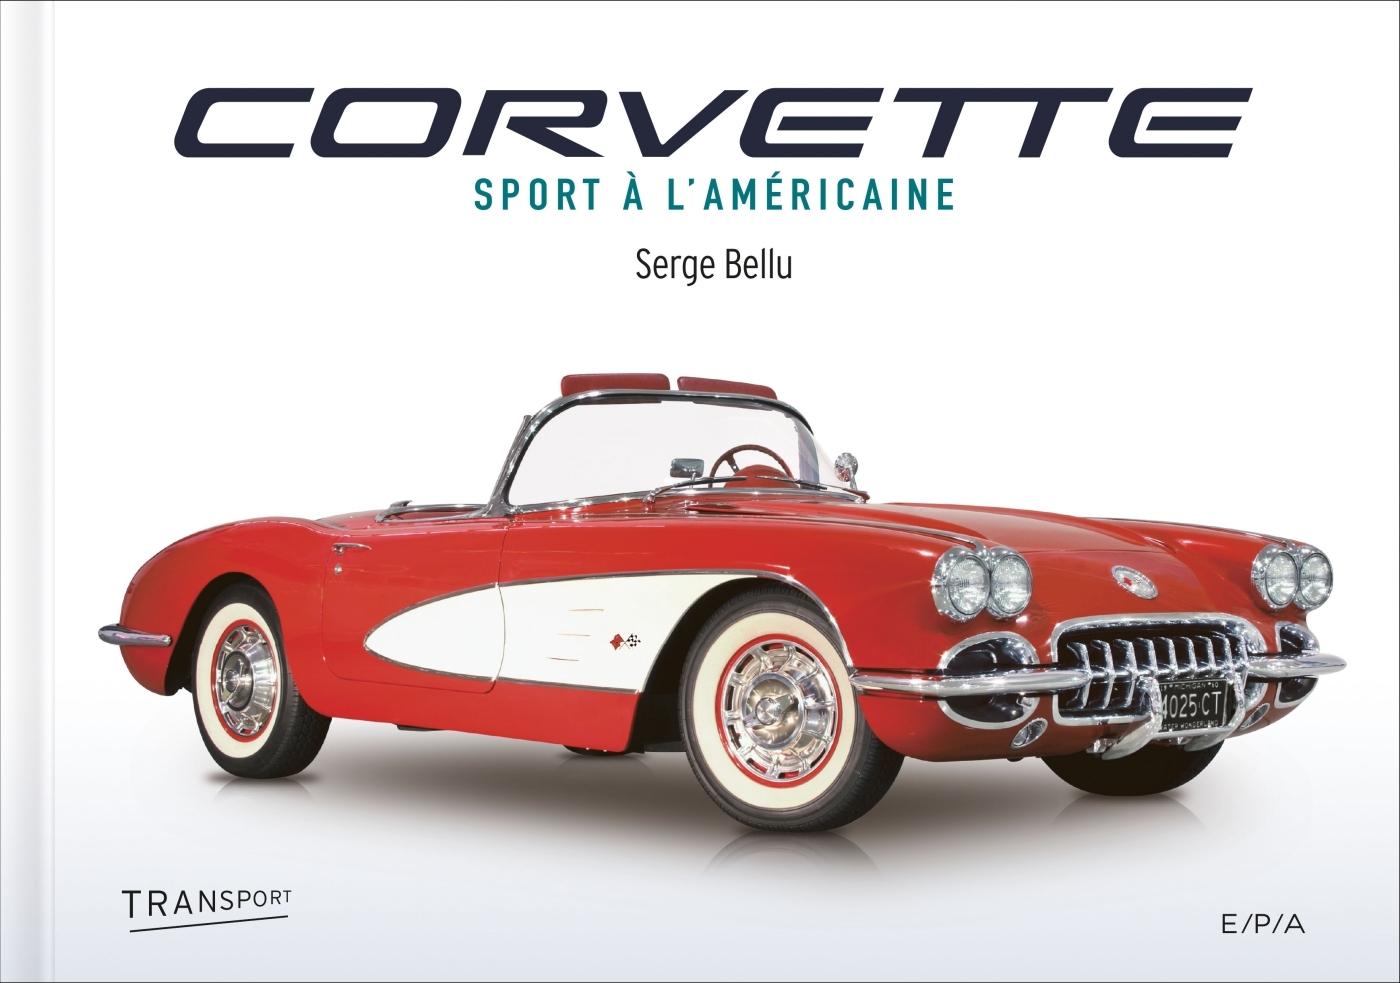 CORVETTE - SPORT A L'AMERICAINE